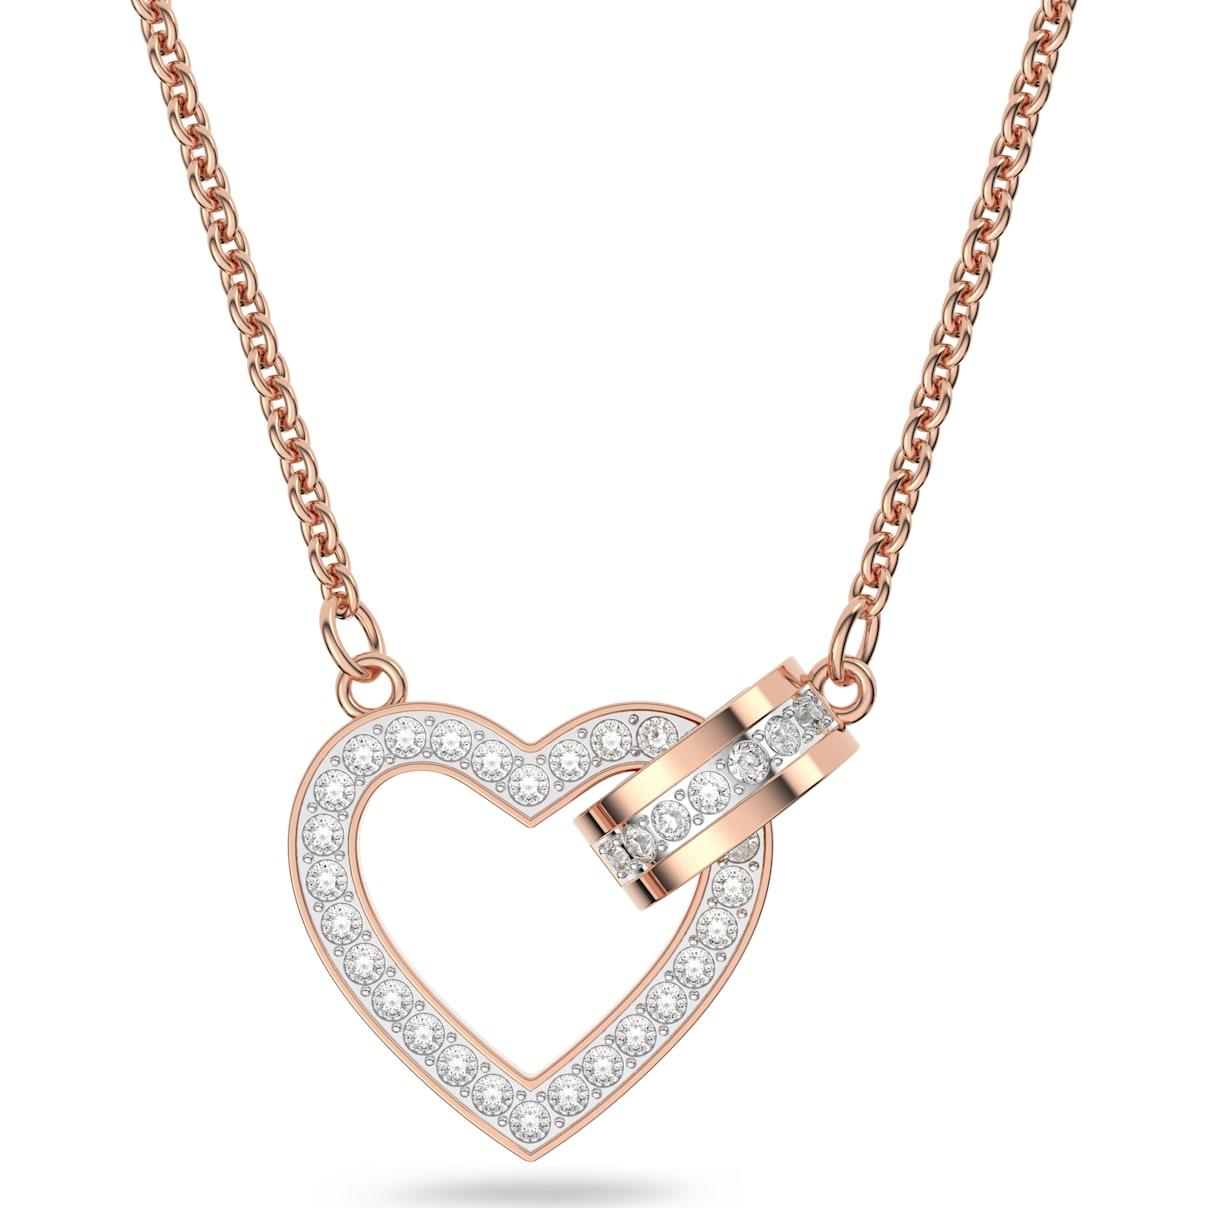 Swarovski Lovely Necklace, White, Rose-gold tone plated